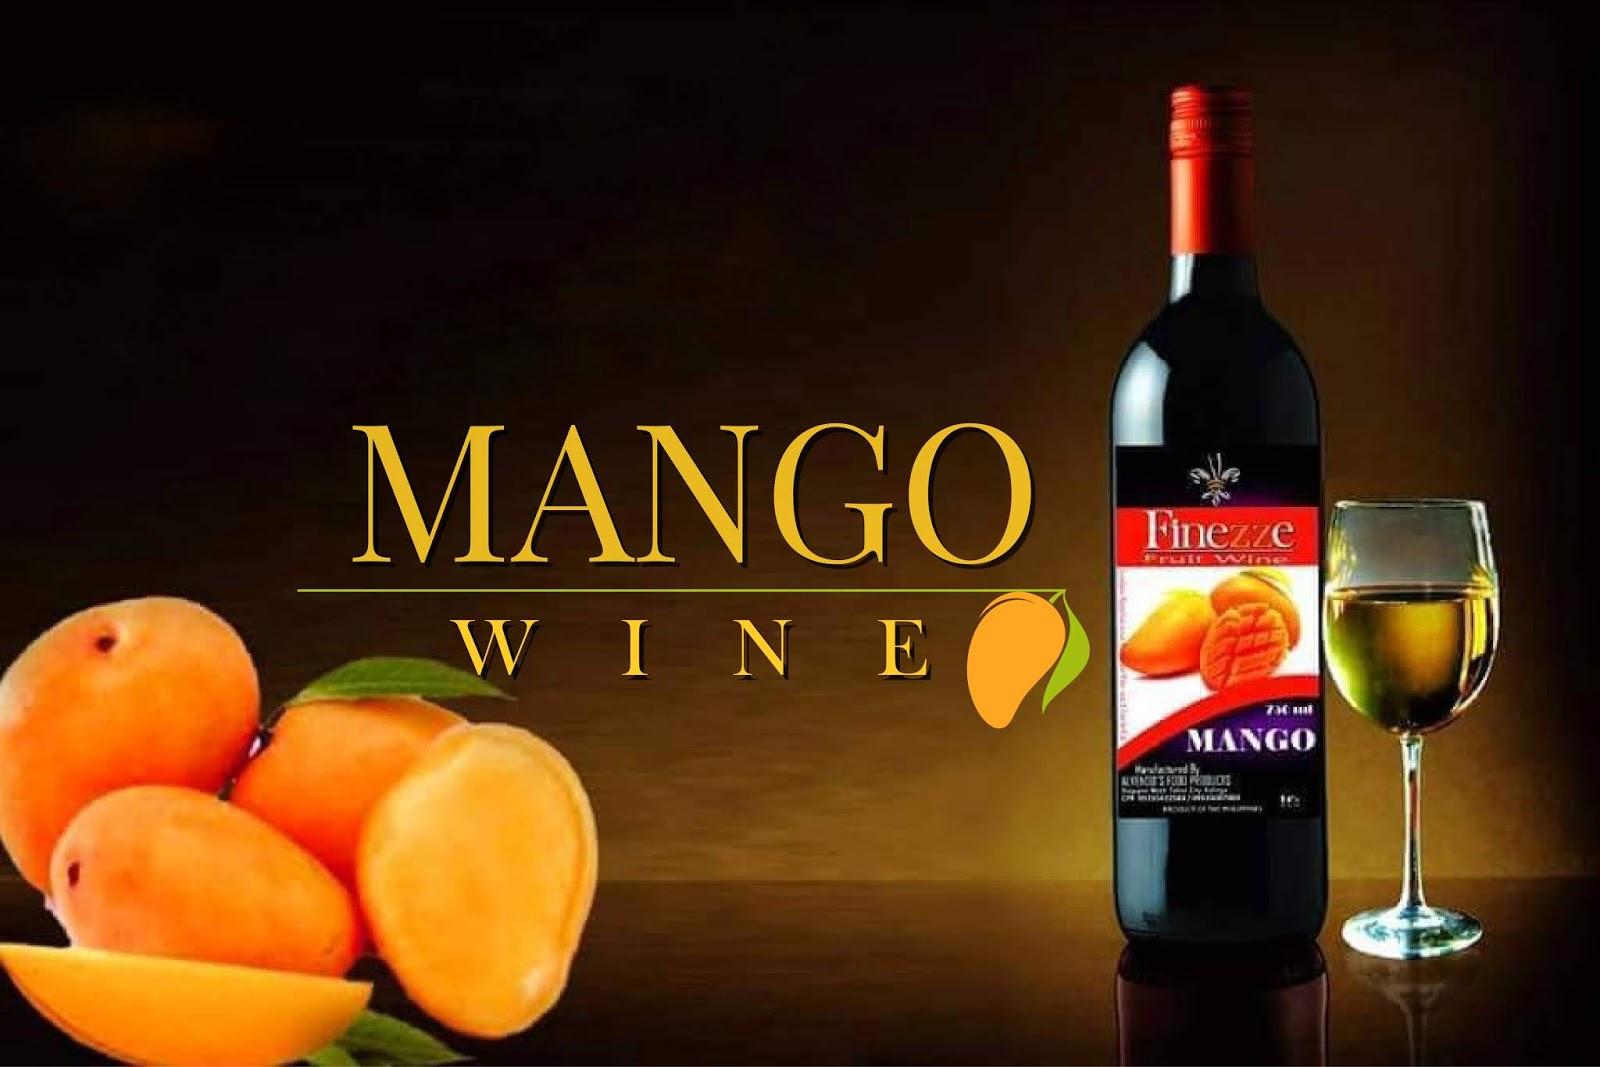 Mango Wine - Finezze